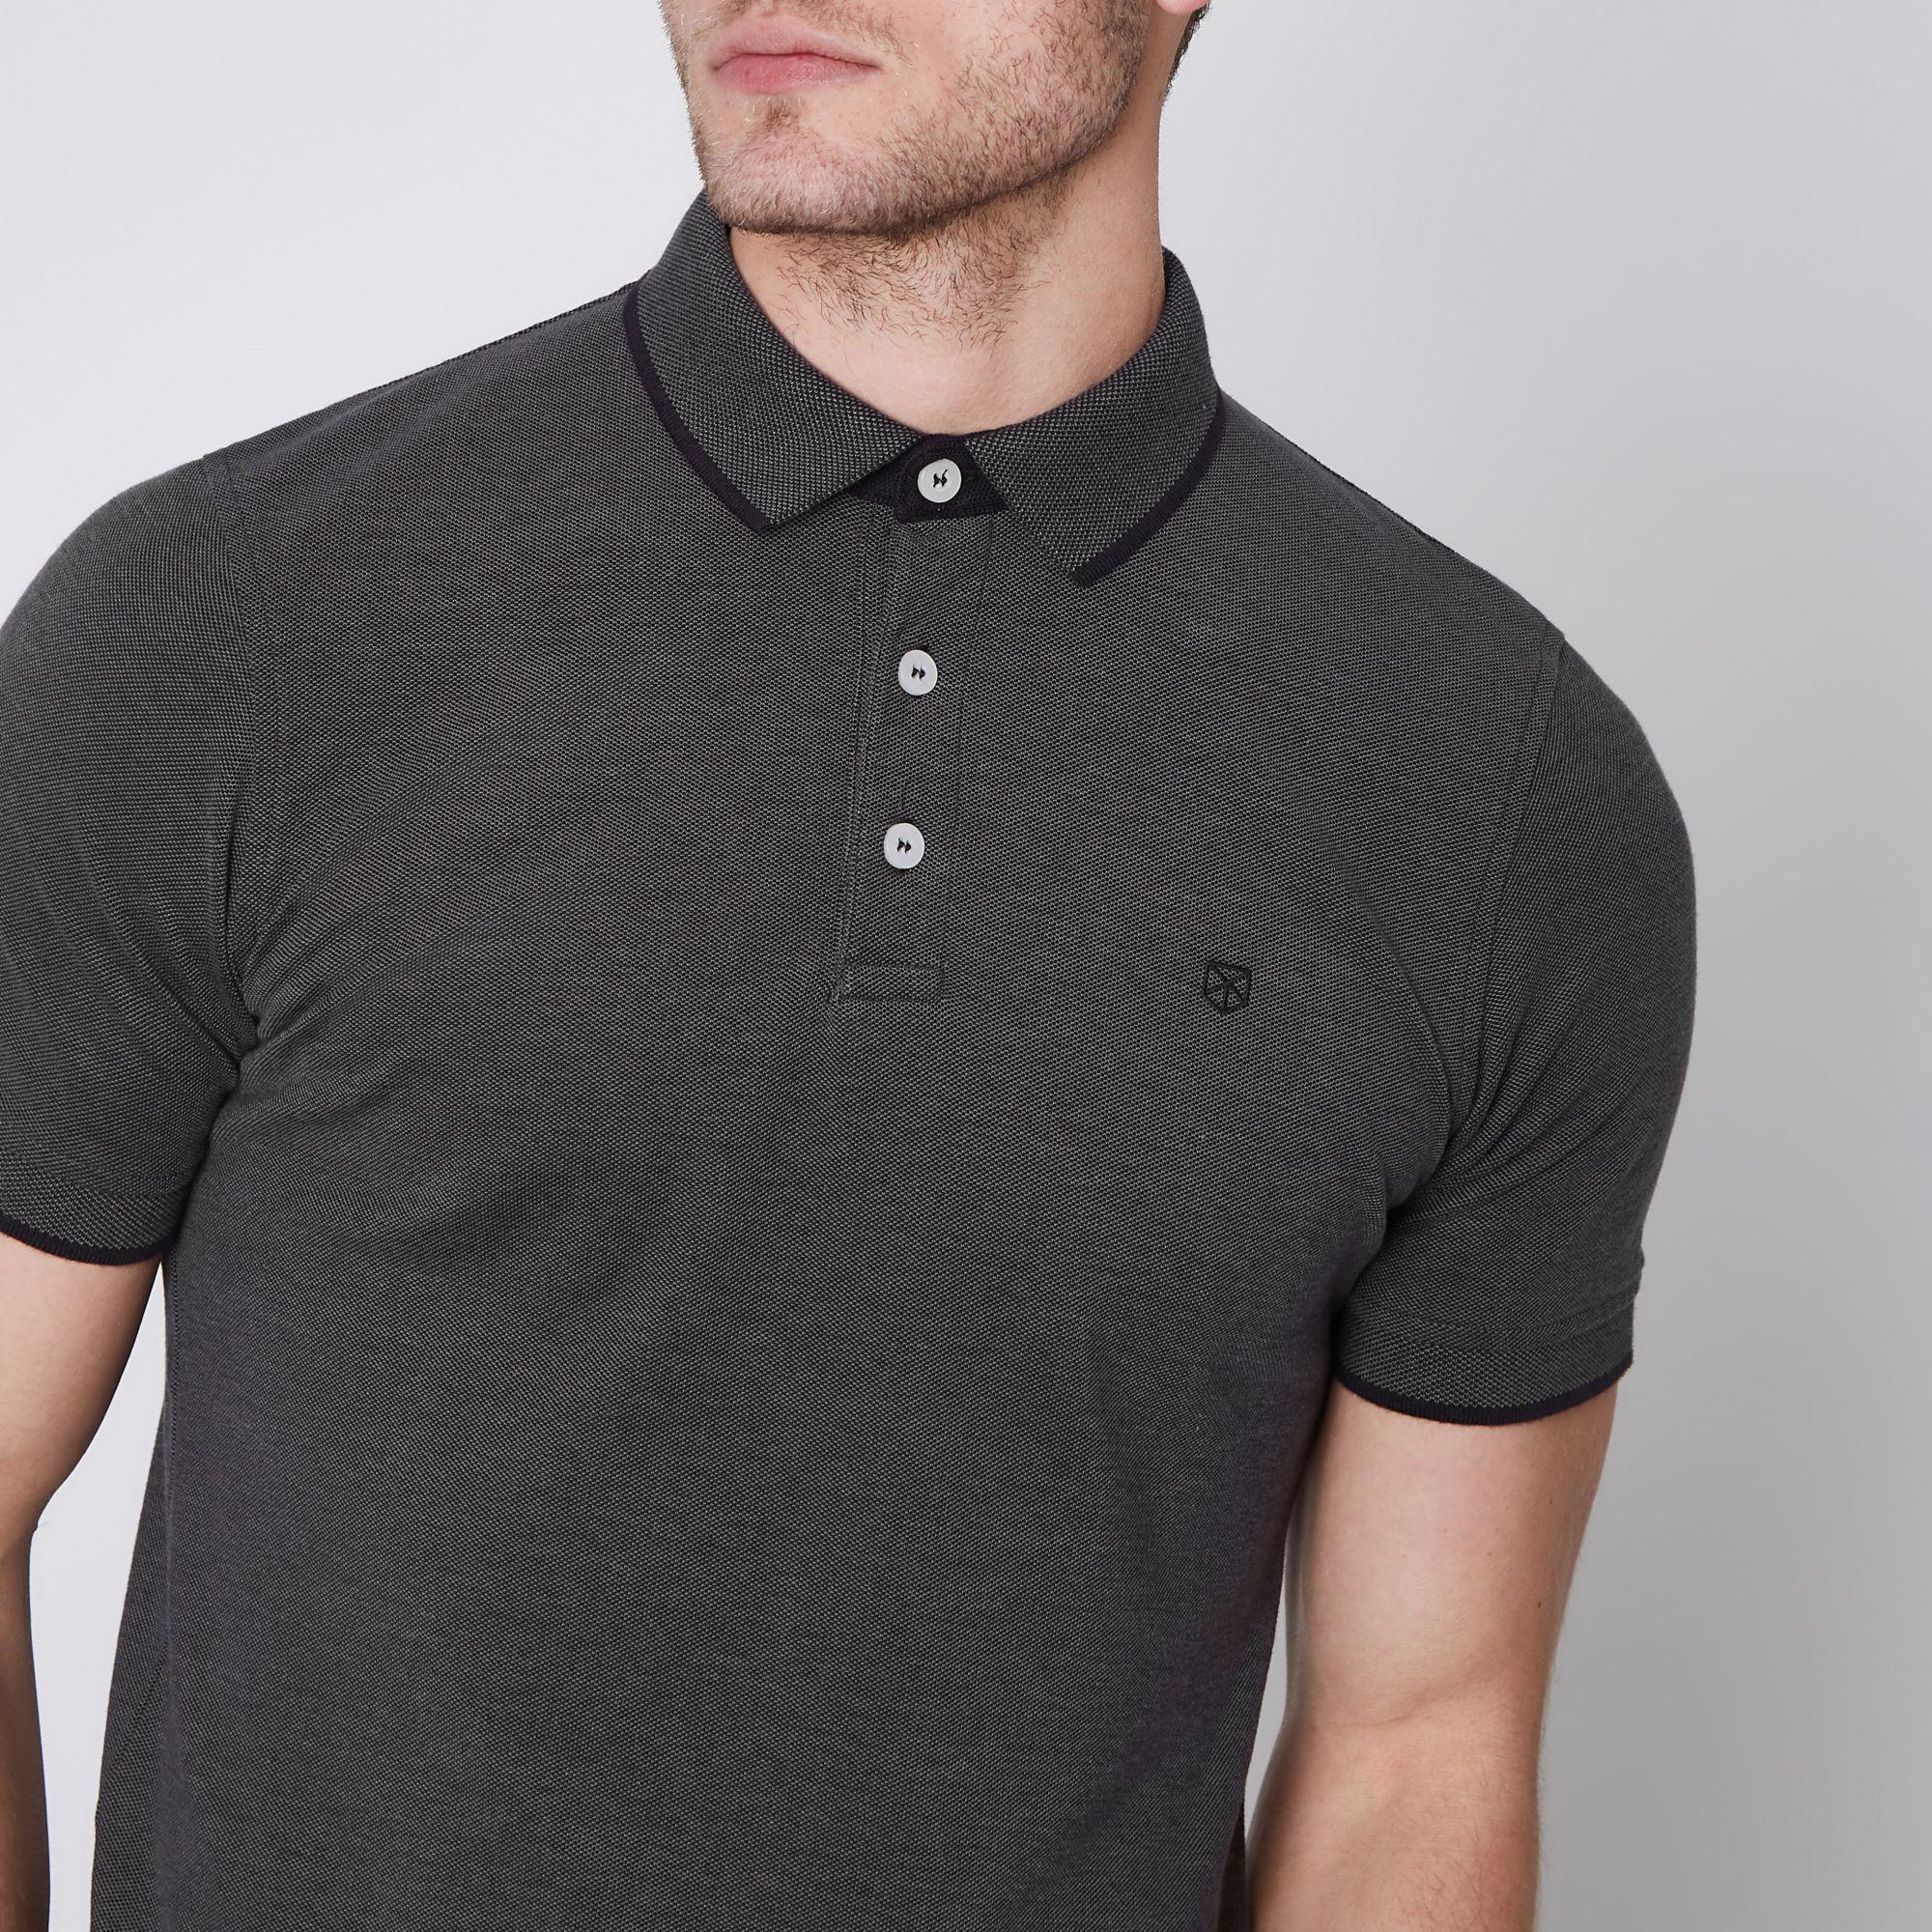 River Island Jack Jones Premium Dark Grey Polo Shirt In Gray For